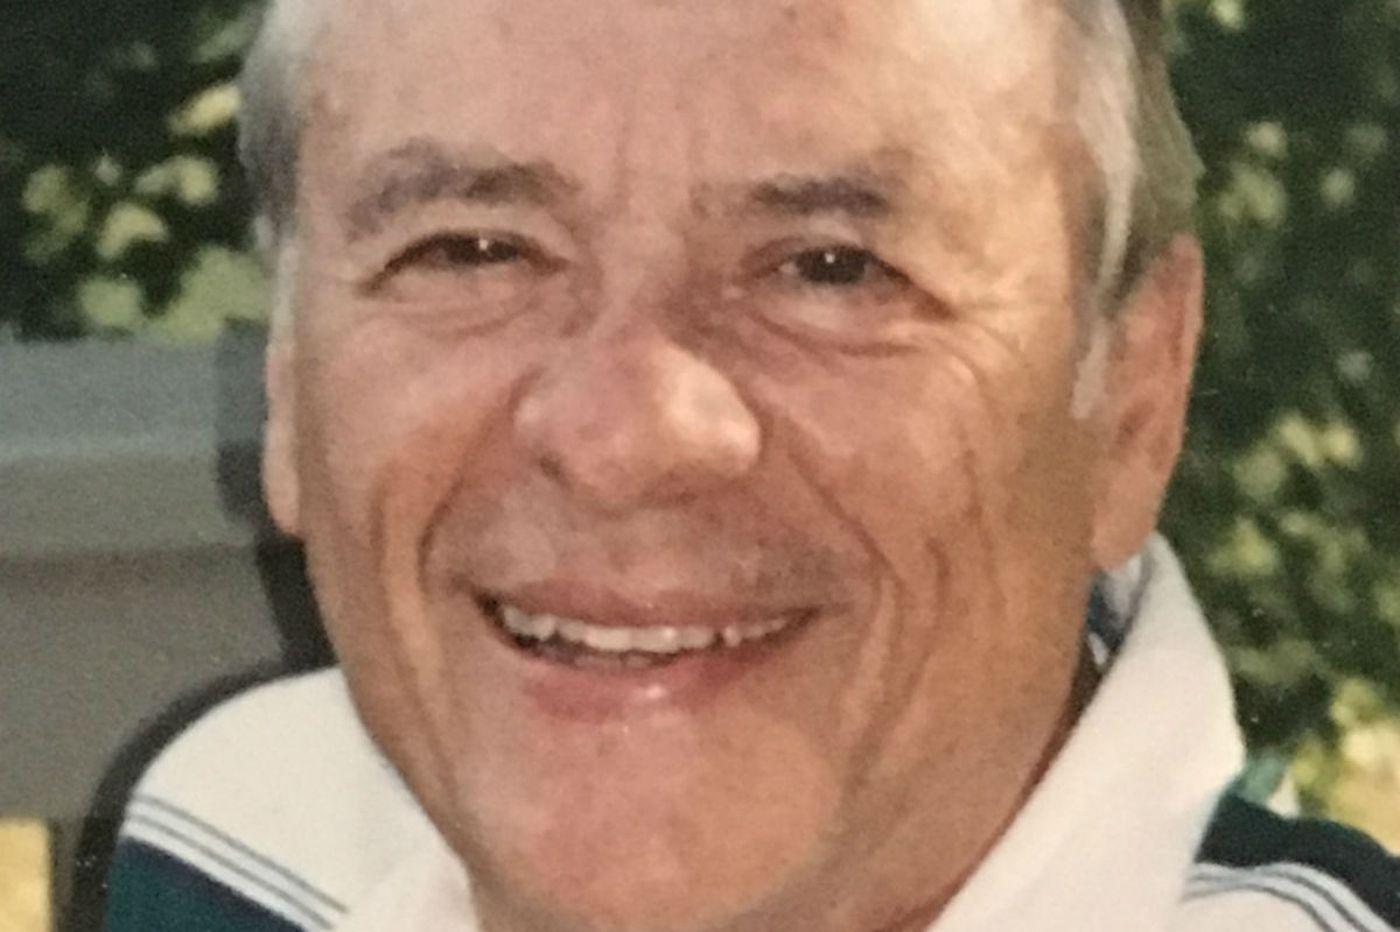 Dr. George E. Ruff, 89, psychiatrist who helped pick Mercury Seven astronauts